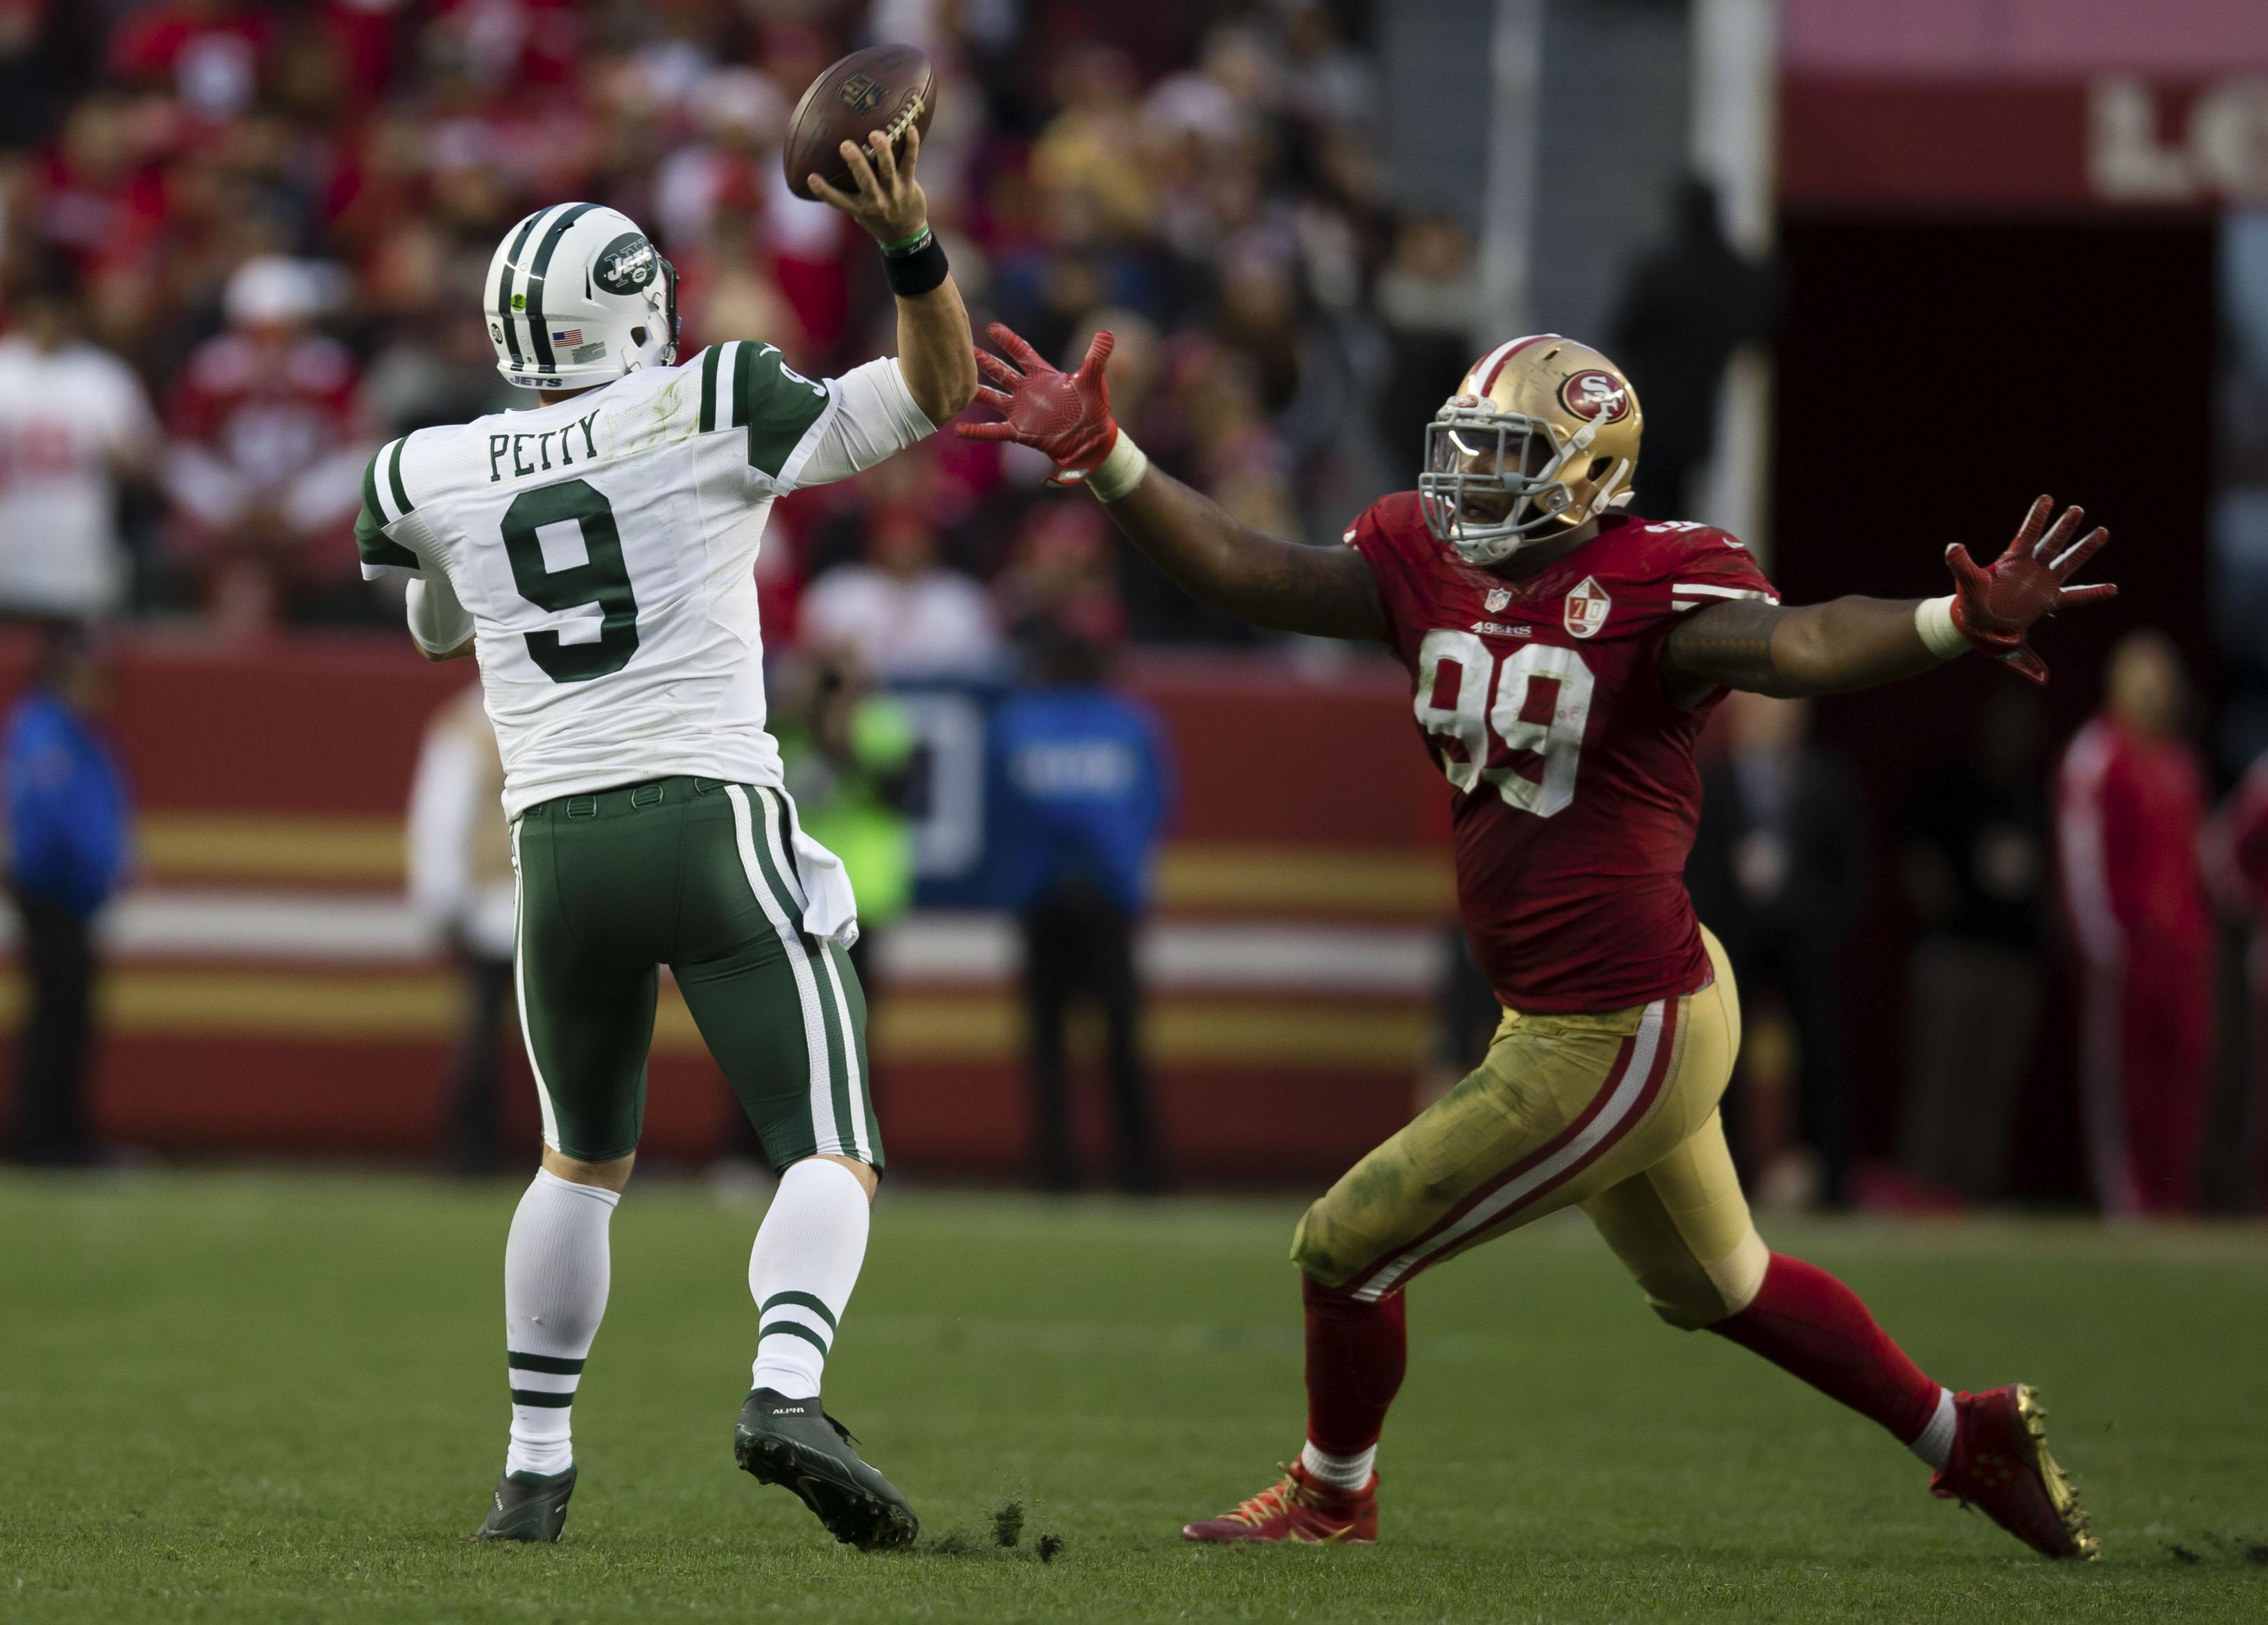 NFL: New York Jets at San Francisco 49ers